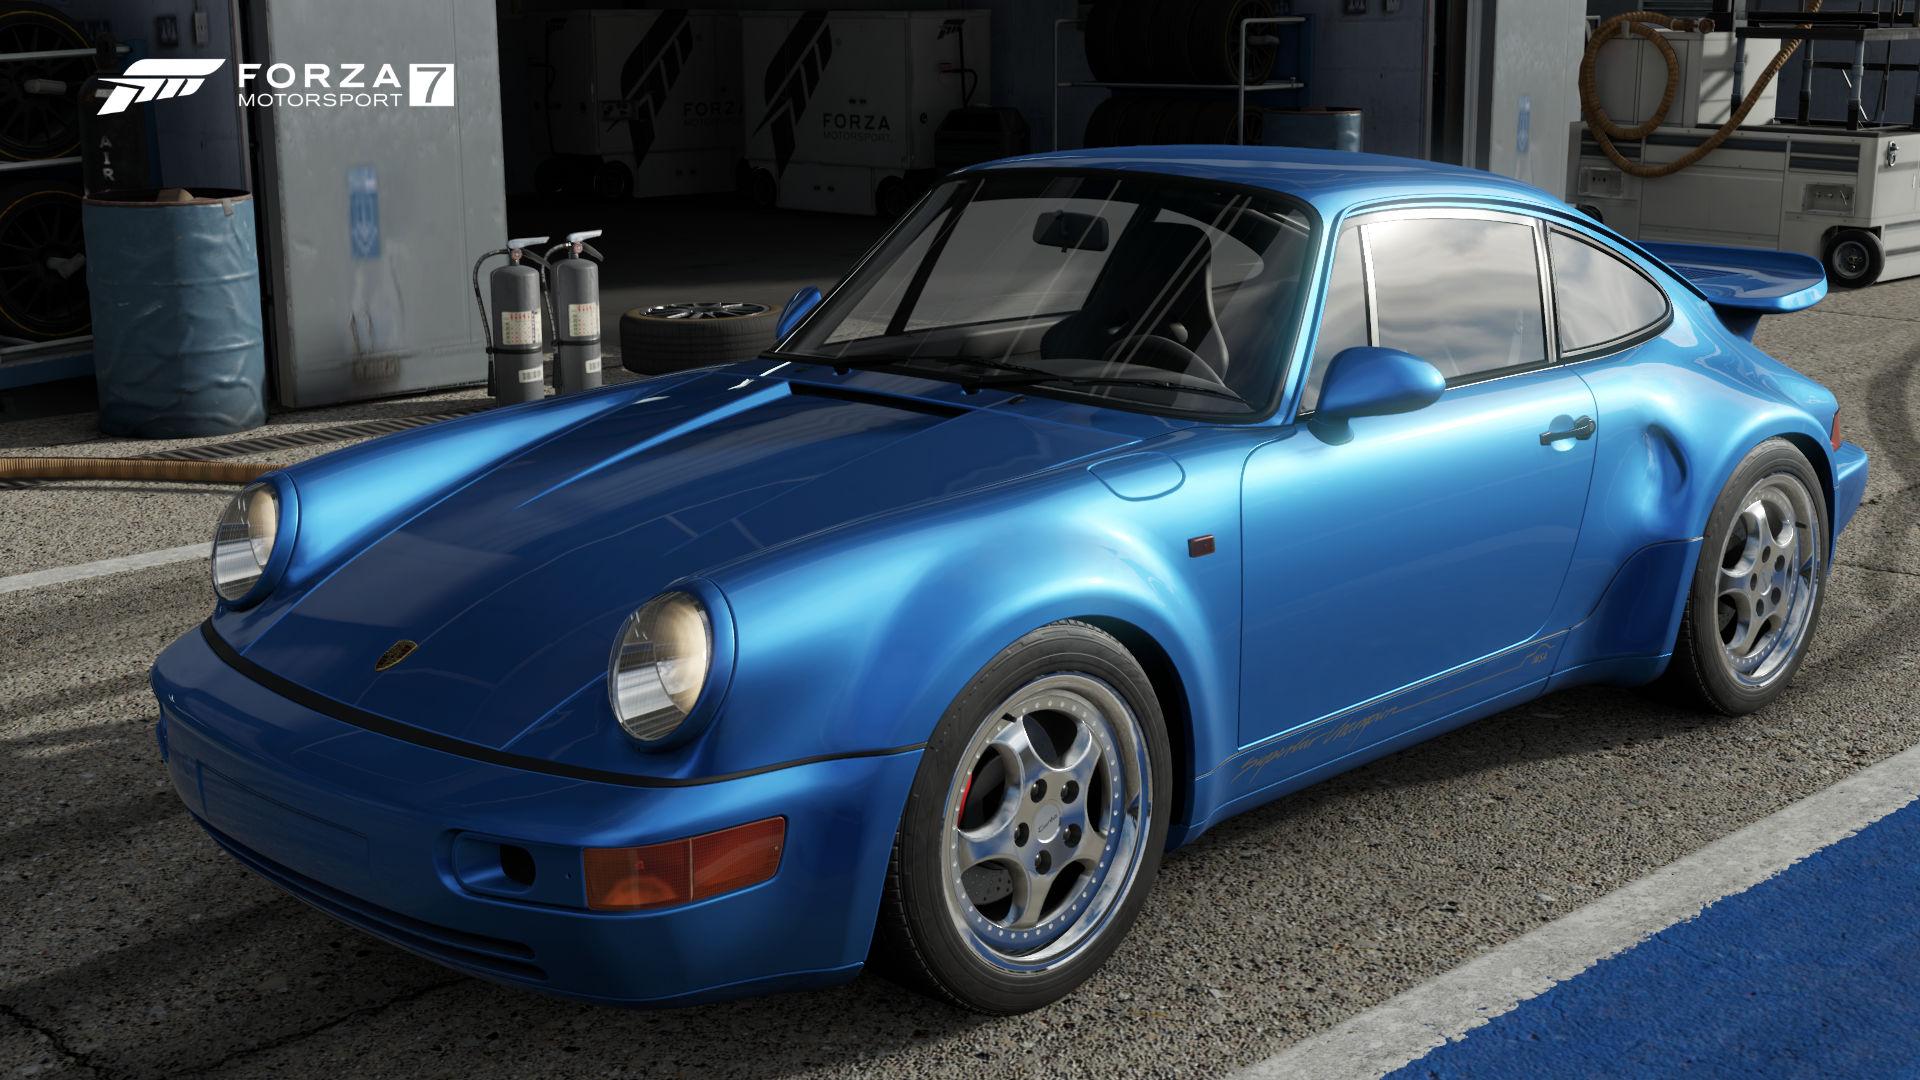 Porsche Turbo S Exclusive Series k